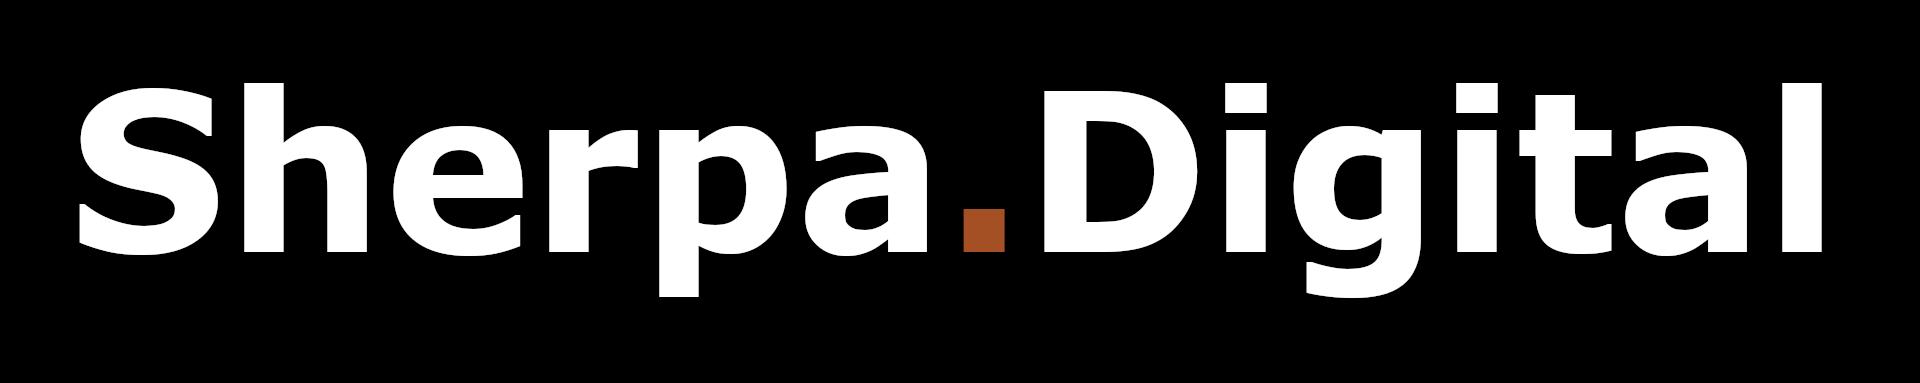 Sherpa Digital